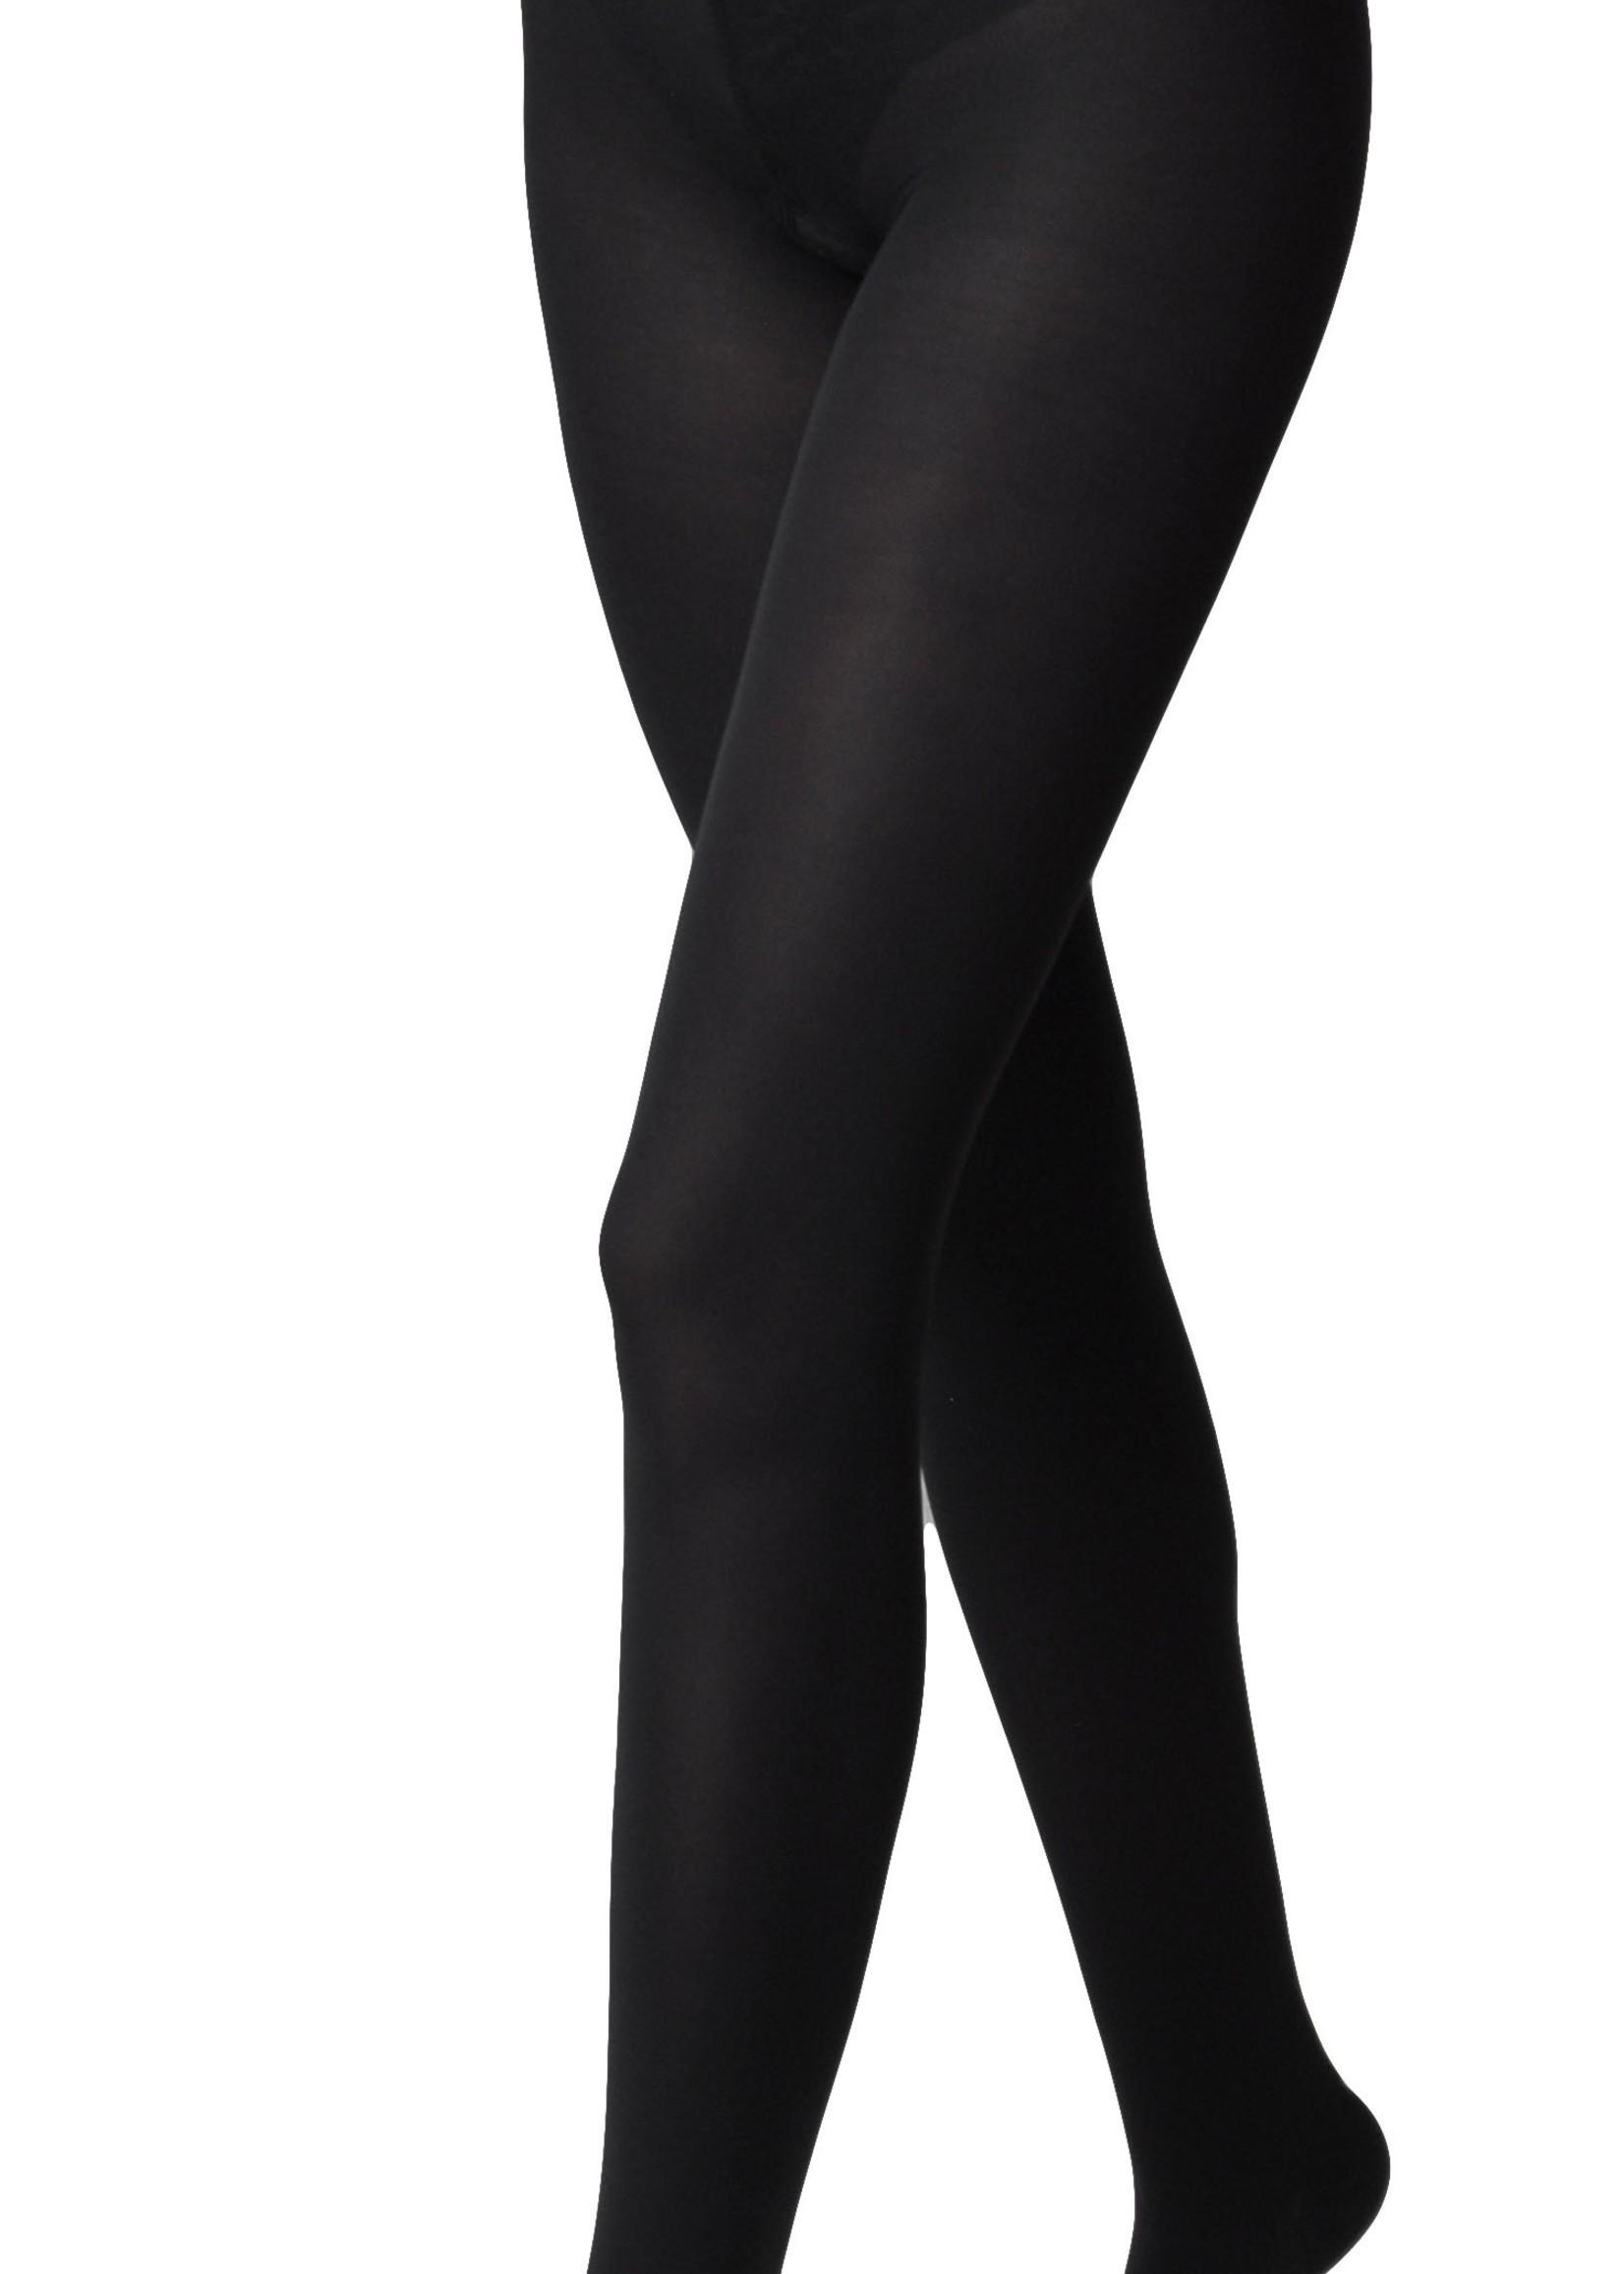 Segretta Segretta Young Coprente 70 Matte Opaque Panty met medium compressie - Grey